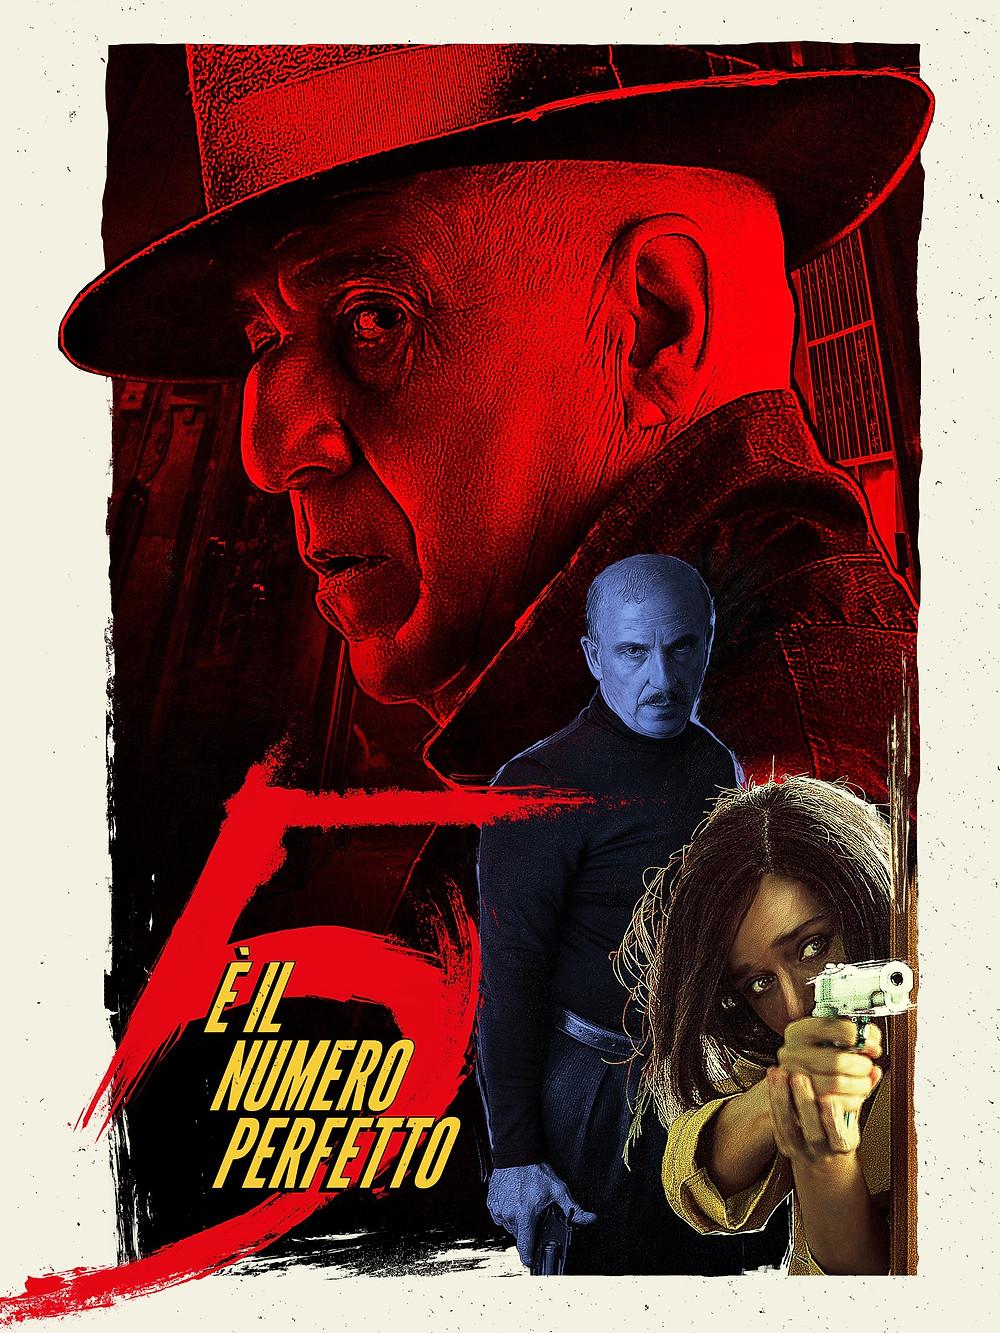 Filme Cinco é o Número Perfeito (5 è il Numero Perfetto: 2019) de Igort